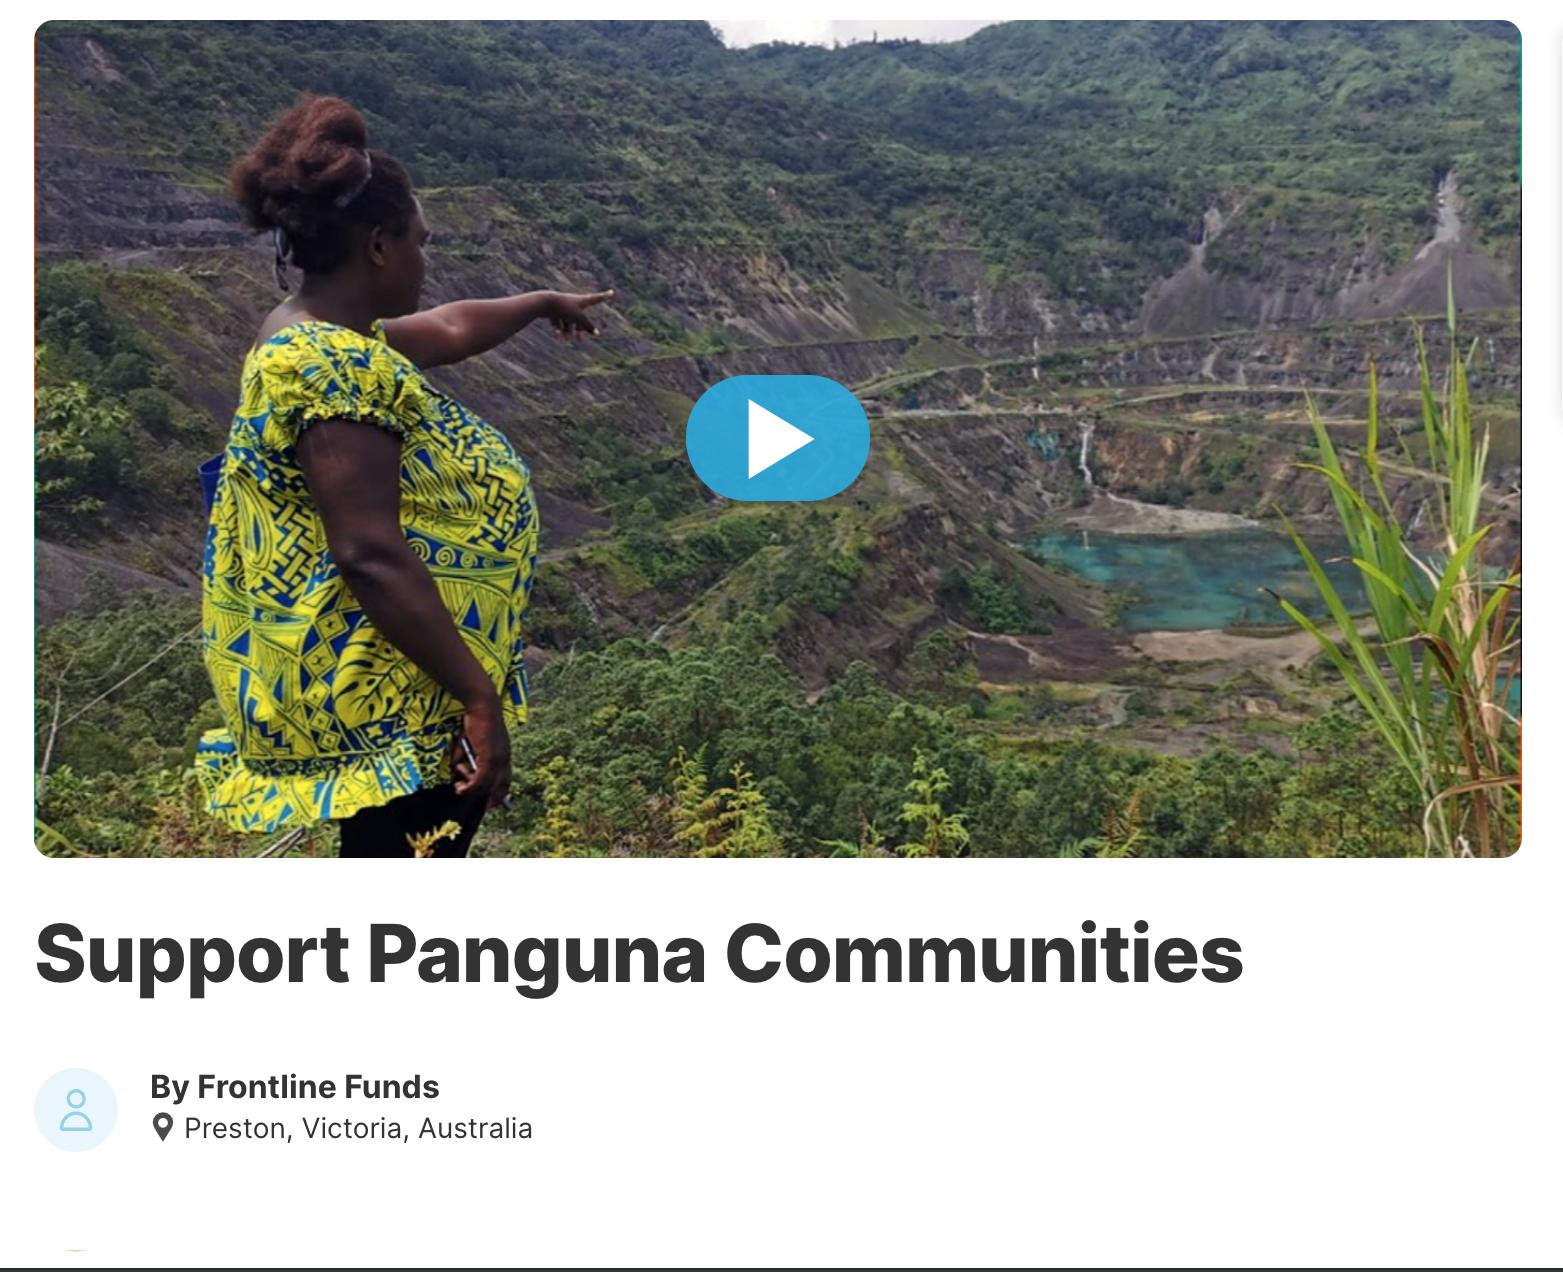 Support Panguna Communities